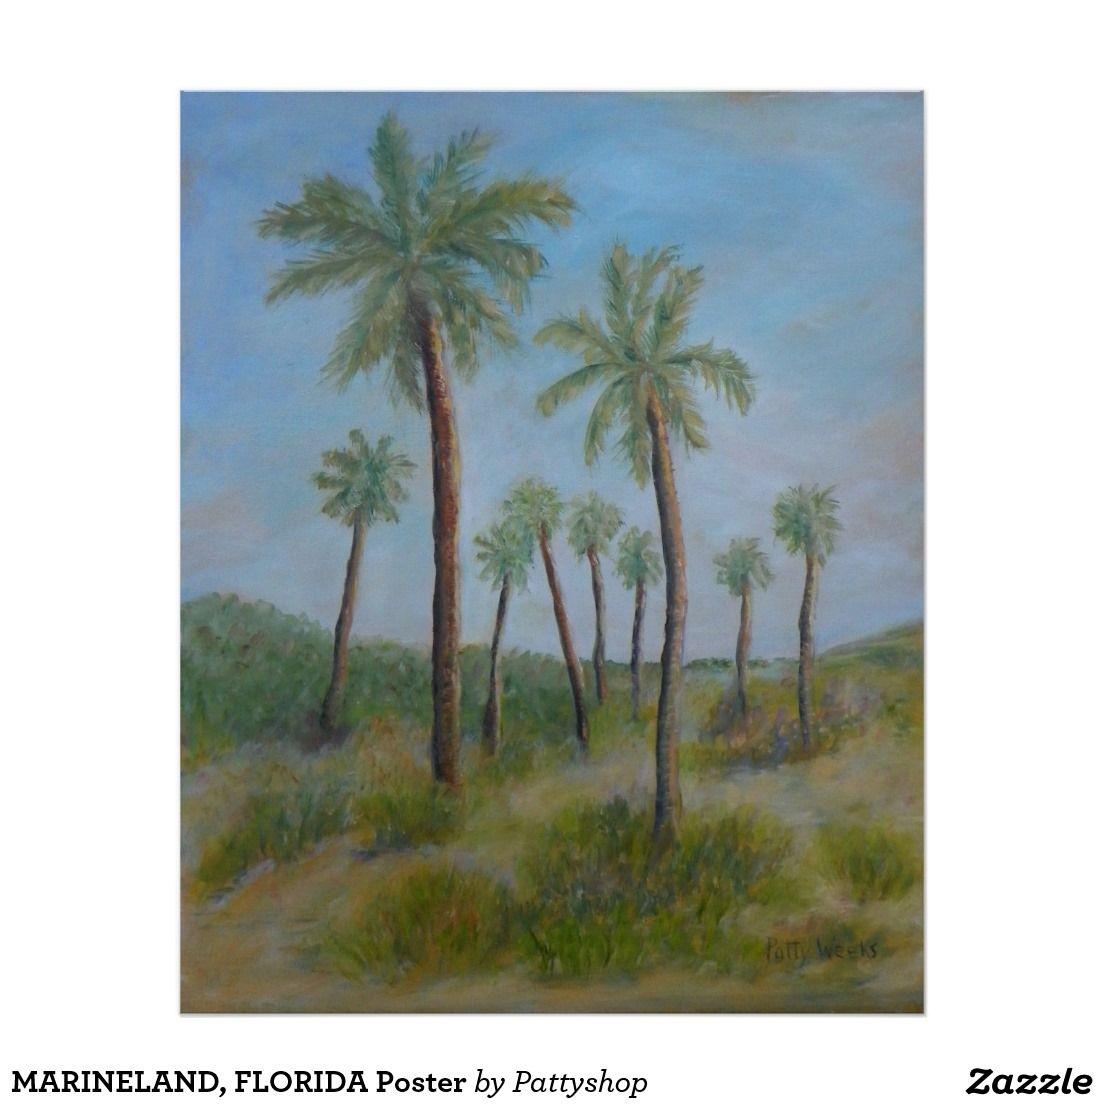 MARINELAND, FLORIDA Poster